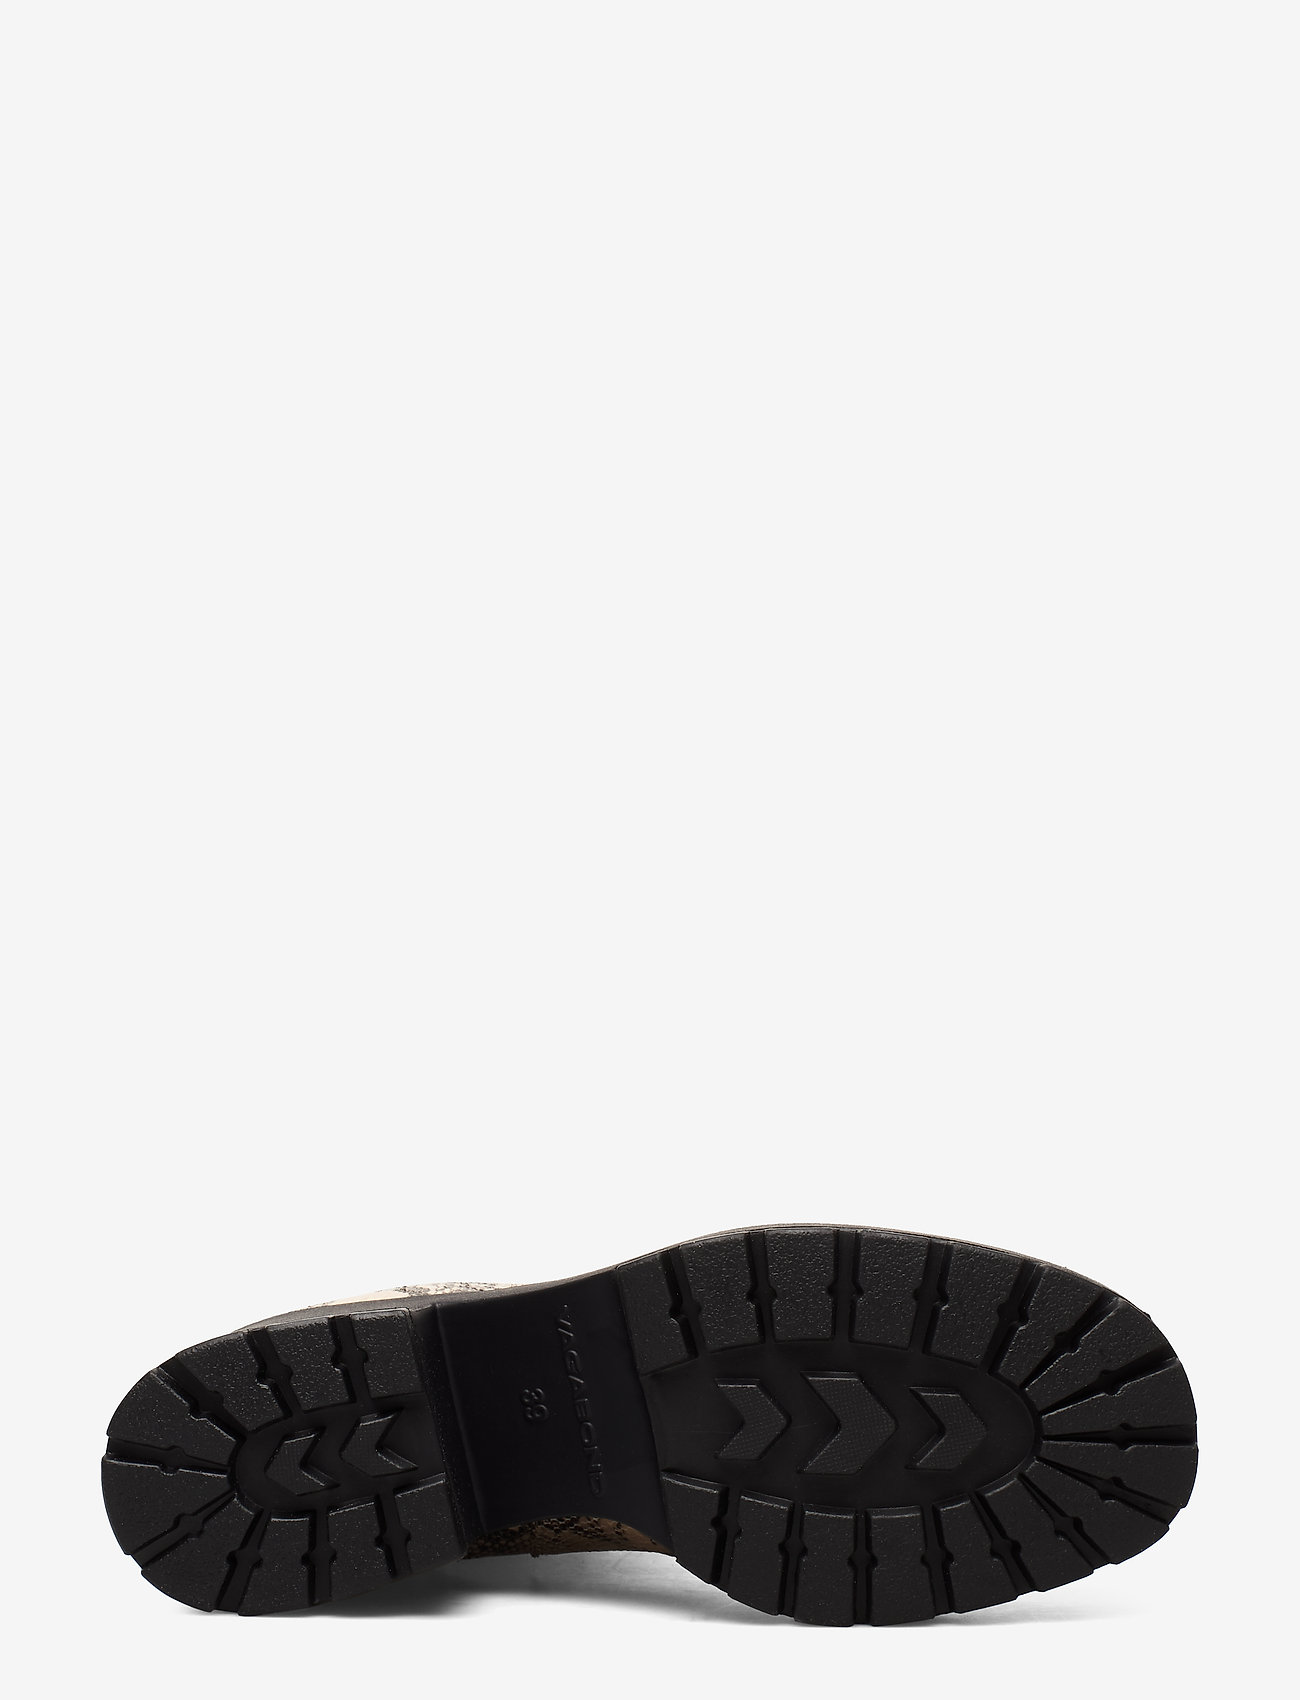 Dioon (Sand/black) (599.40 kr) - VAGABOND